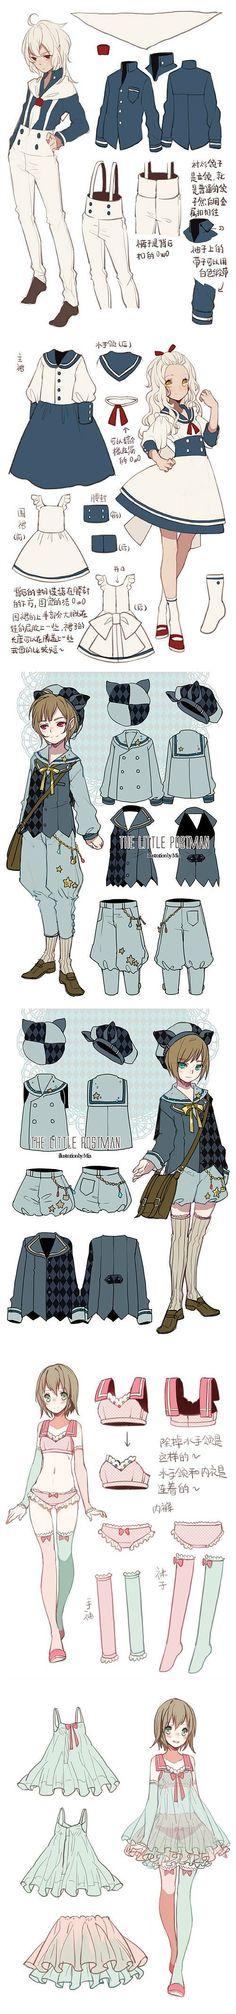 Ropa para personajes